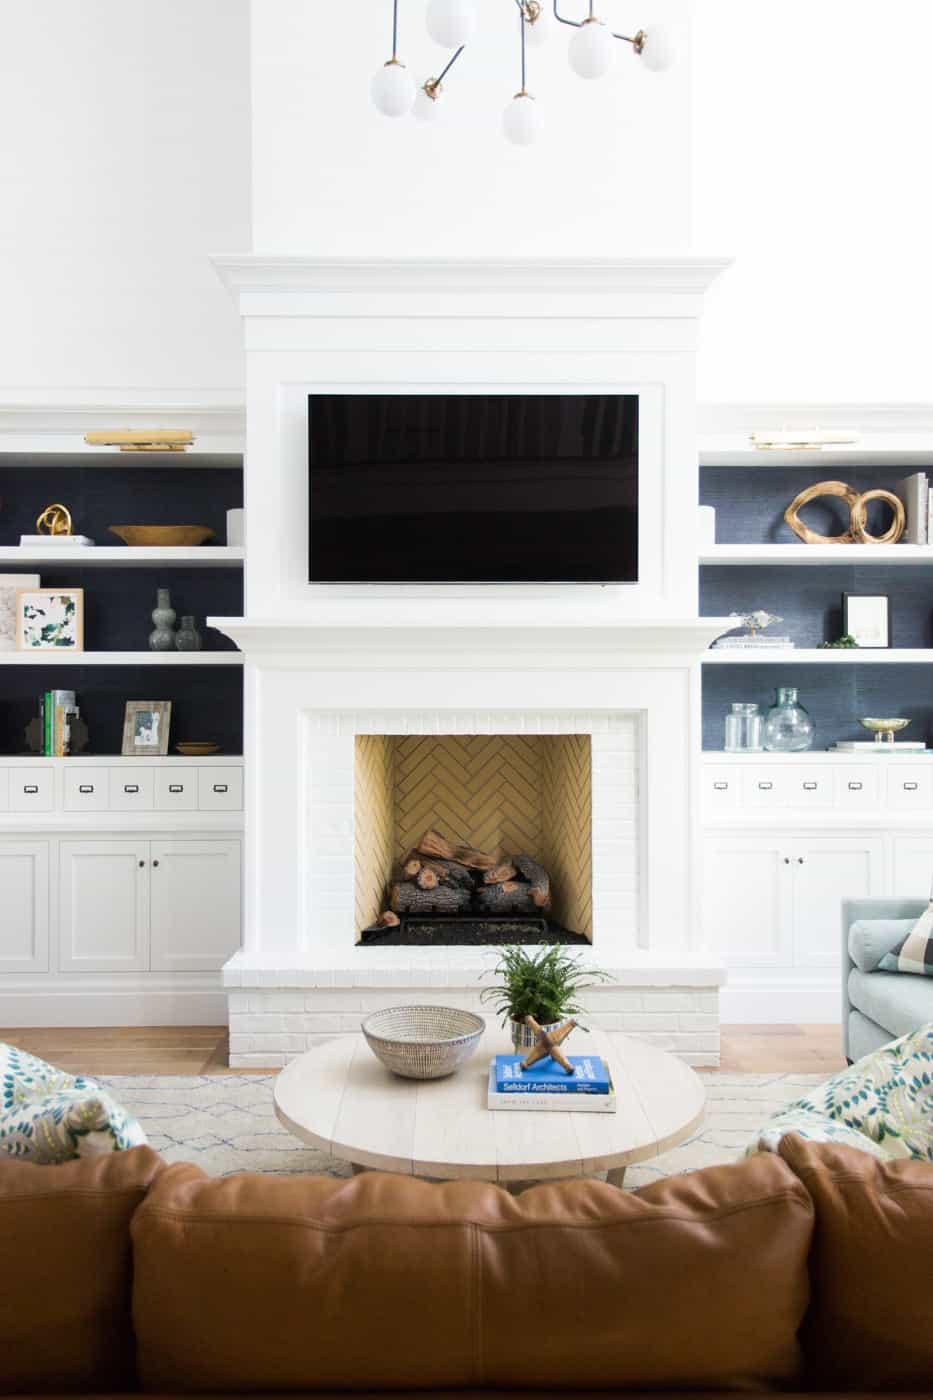 Fireplace Wall Unit Awesome 30 Stunning White Brick Fireplace Ideas Part 1